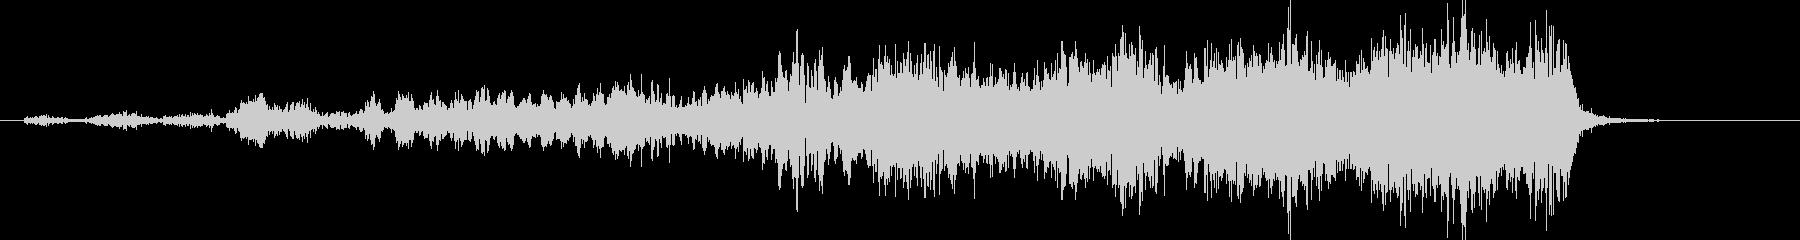 EDM系のDJ/音楽制作用フレーズ!04の未再生の波形